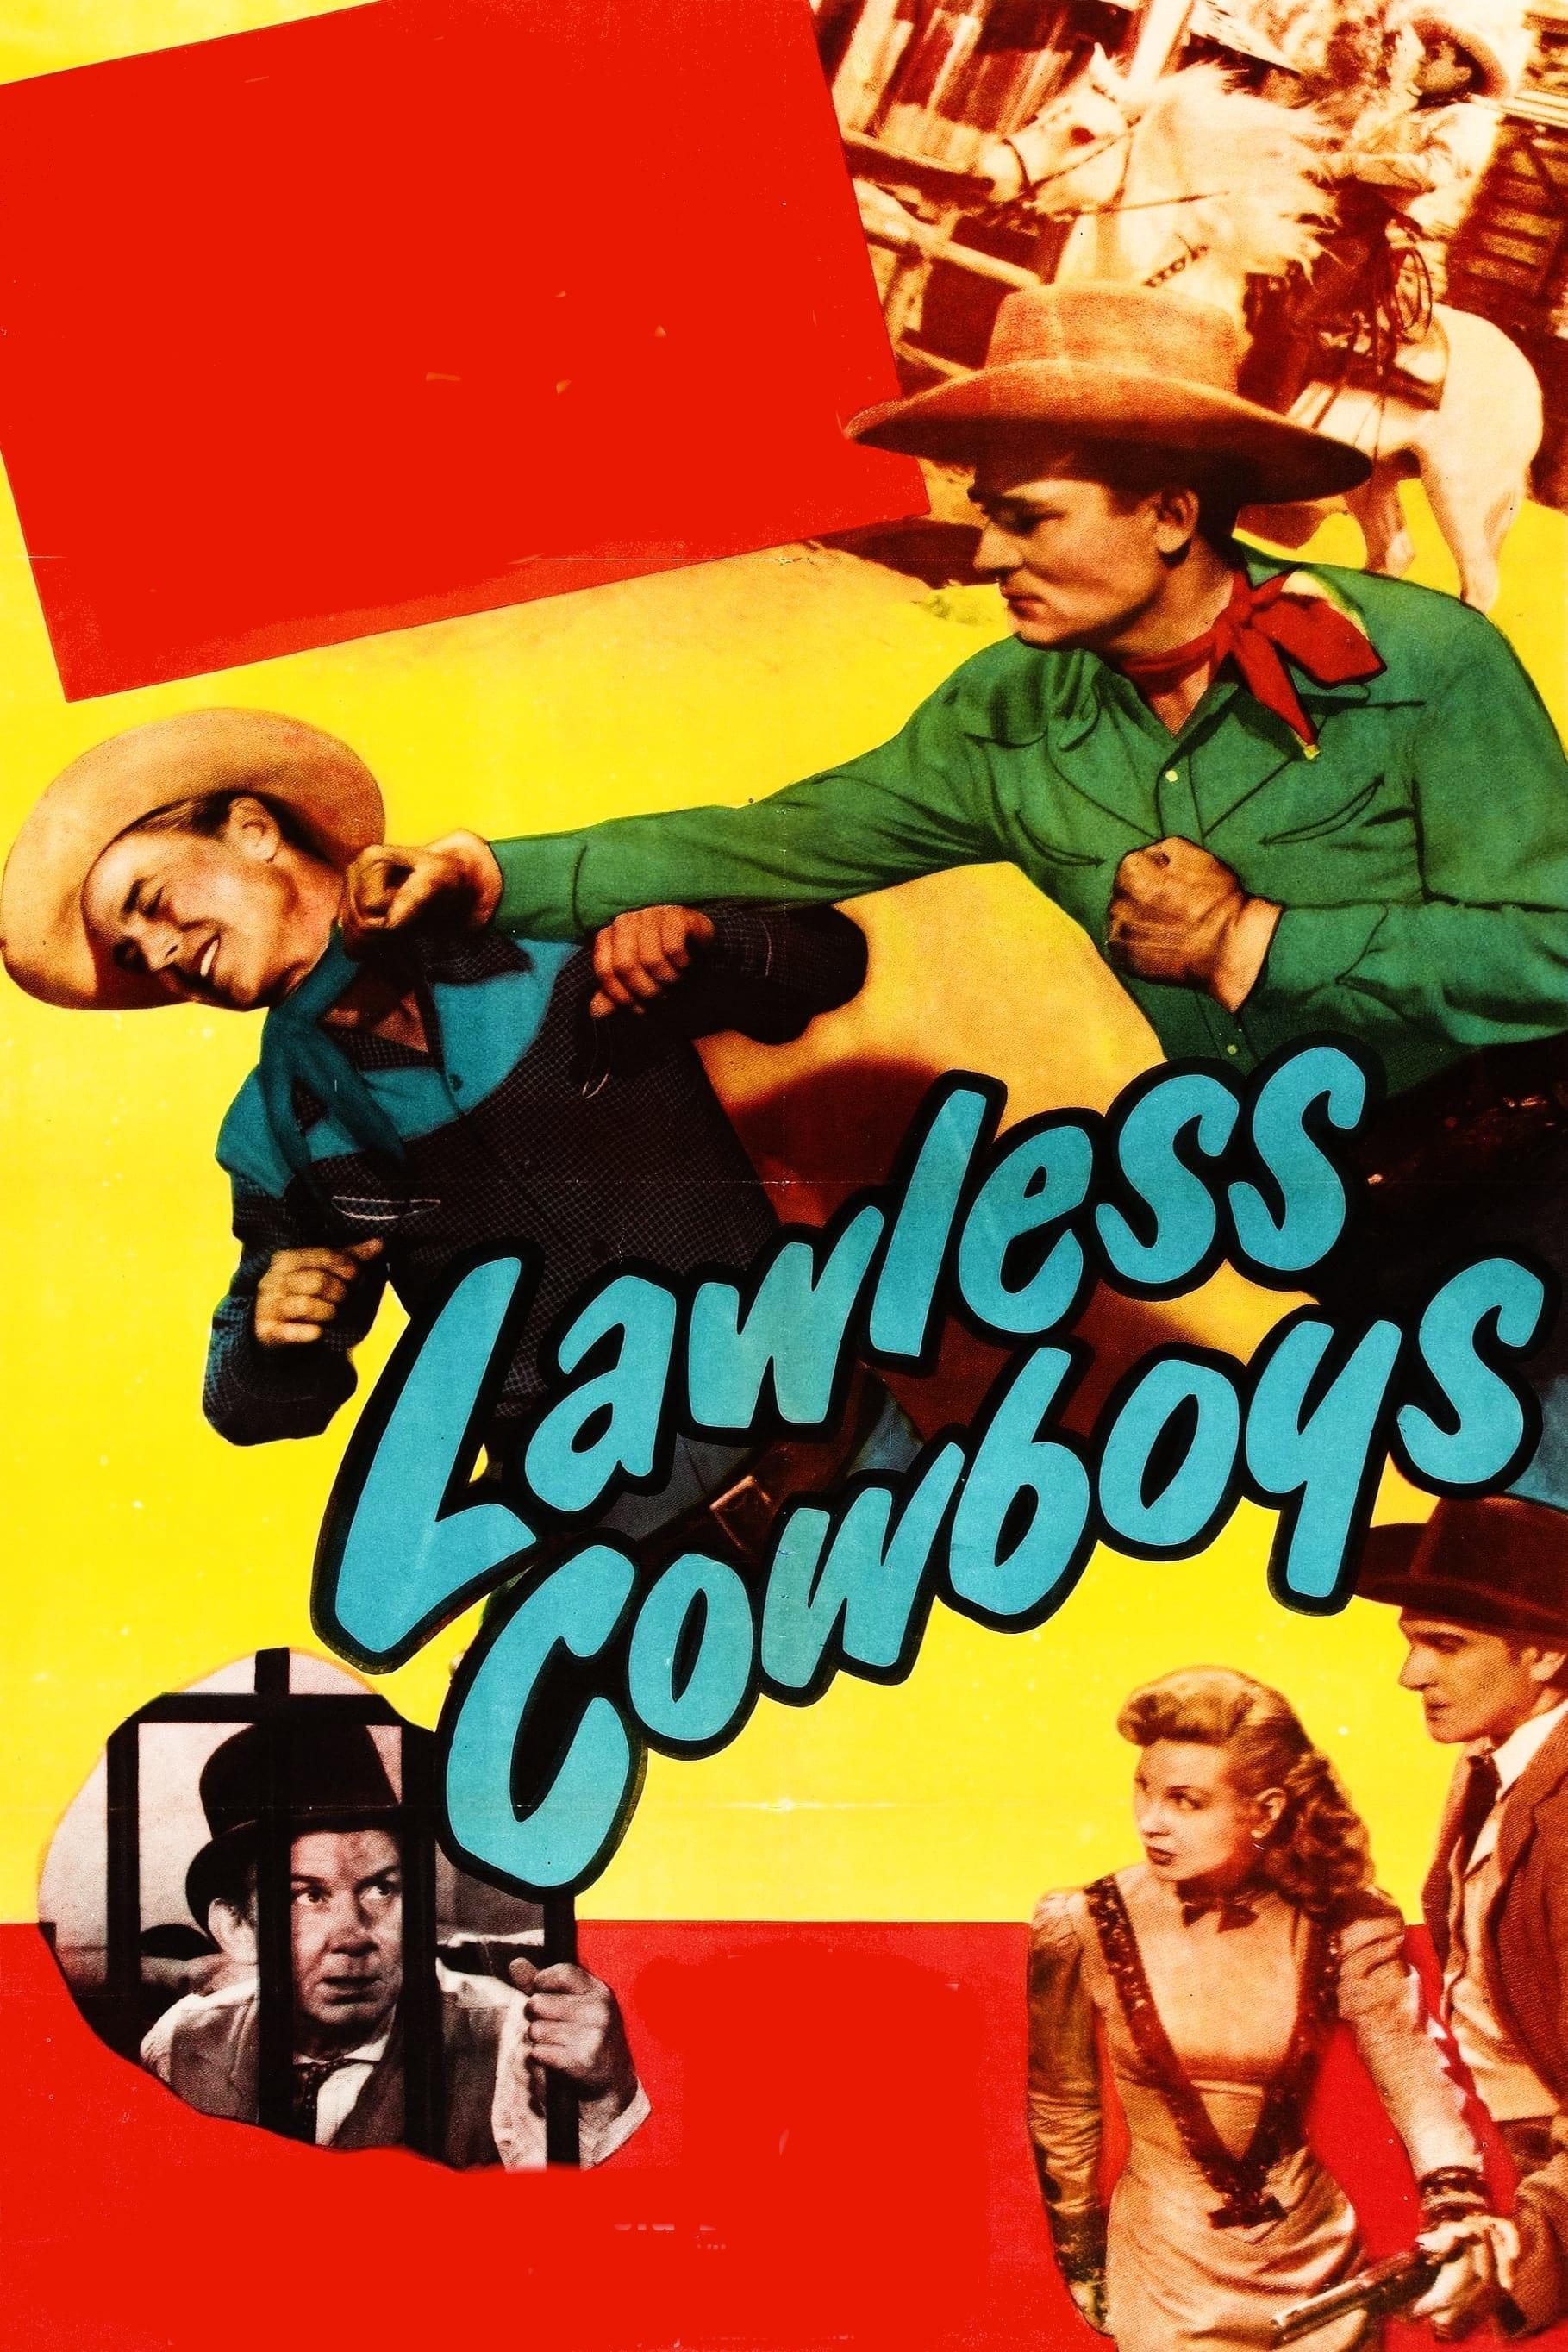 Lawless Cowboys